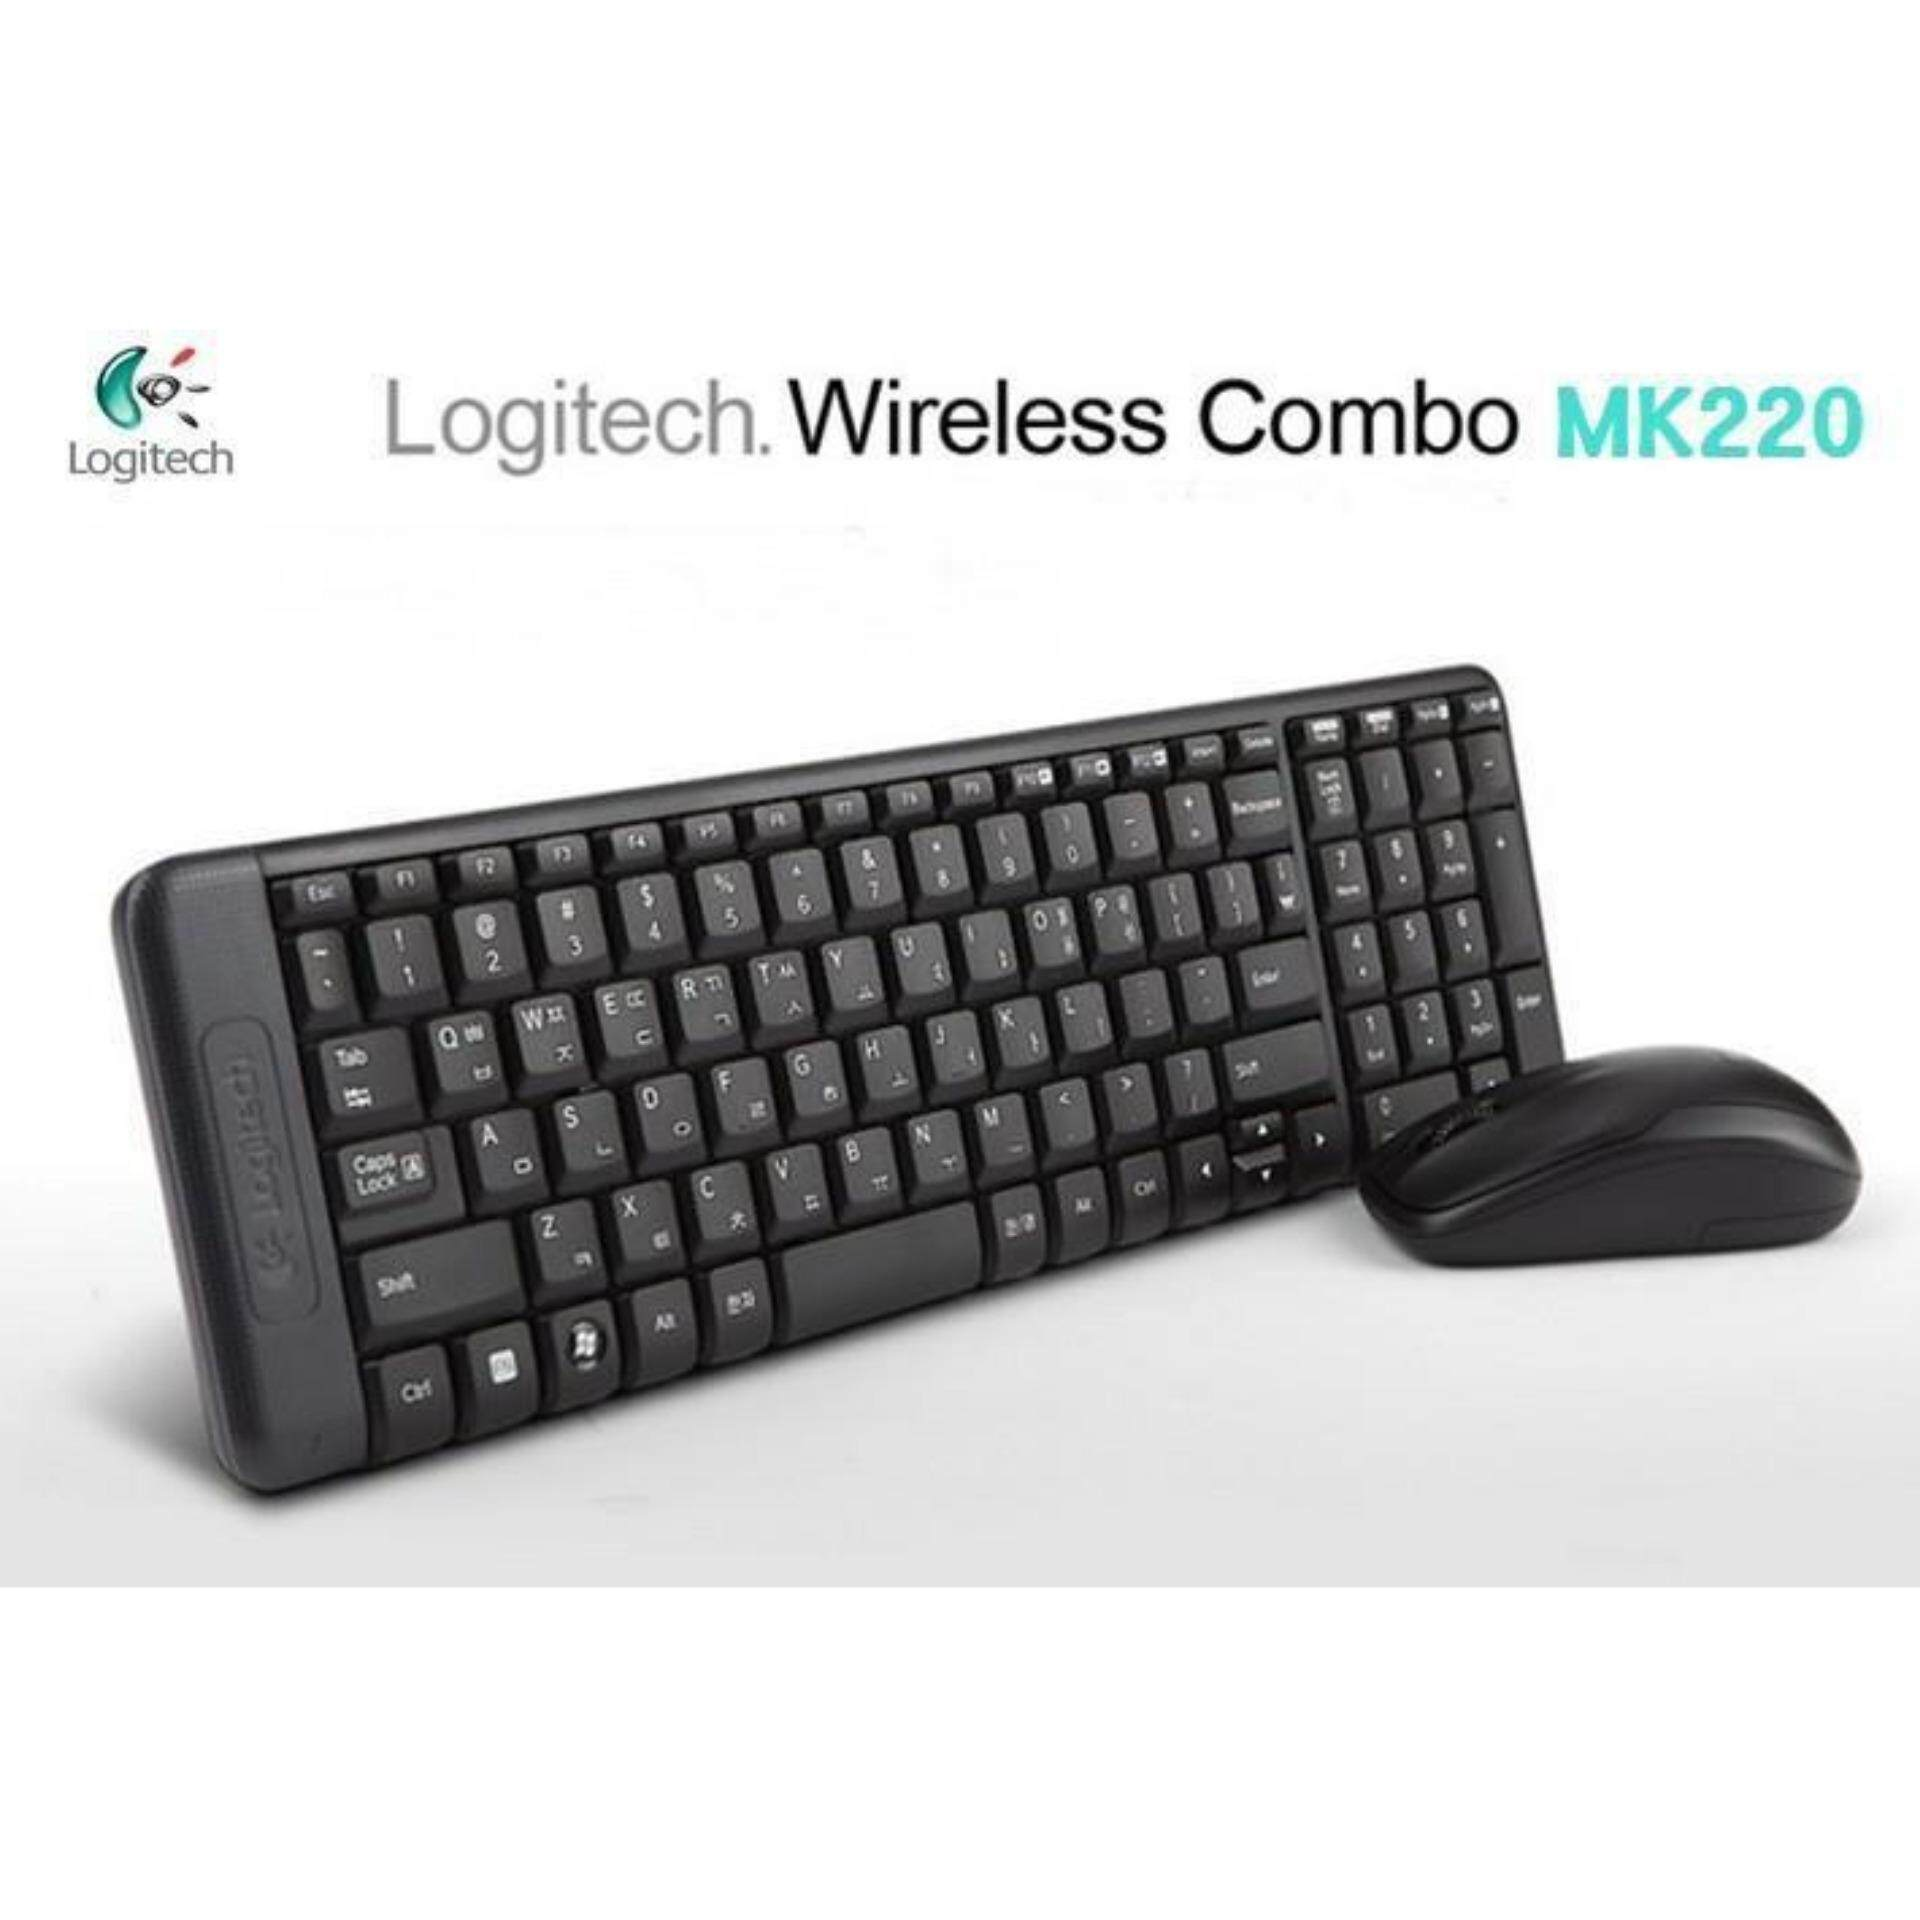 LOGITECH MK220 Wireless Combo Keyboard & Mouse